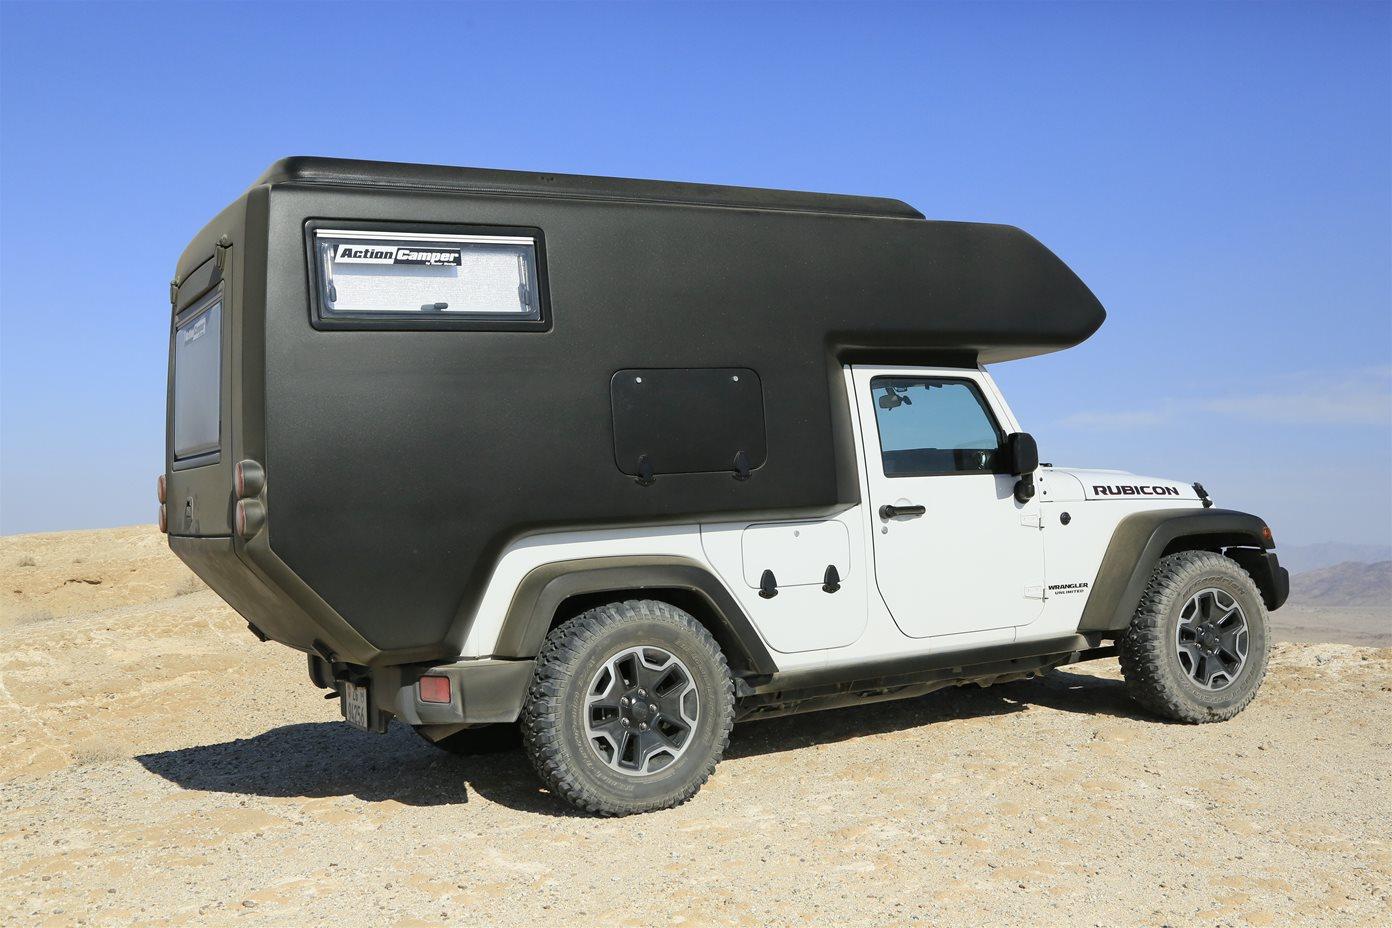 Jeep 174 Actioncamper 169 Jku Expedition Ready Pop Up Camper